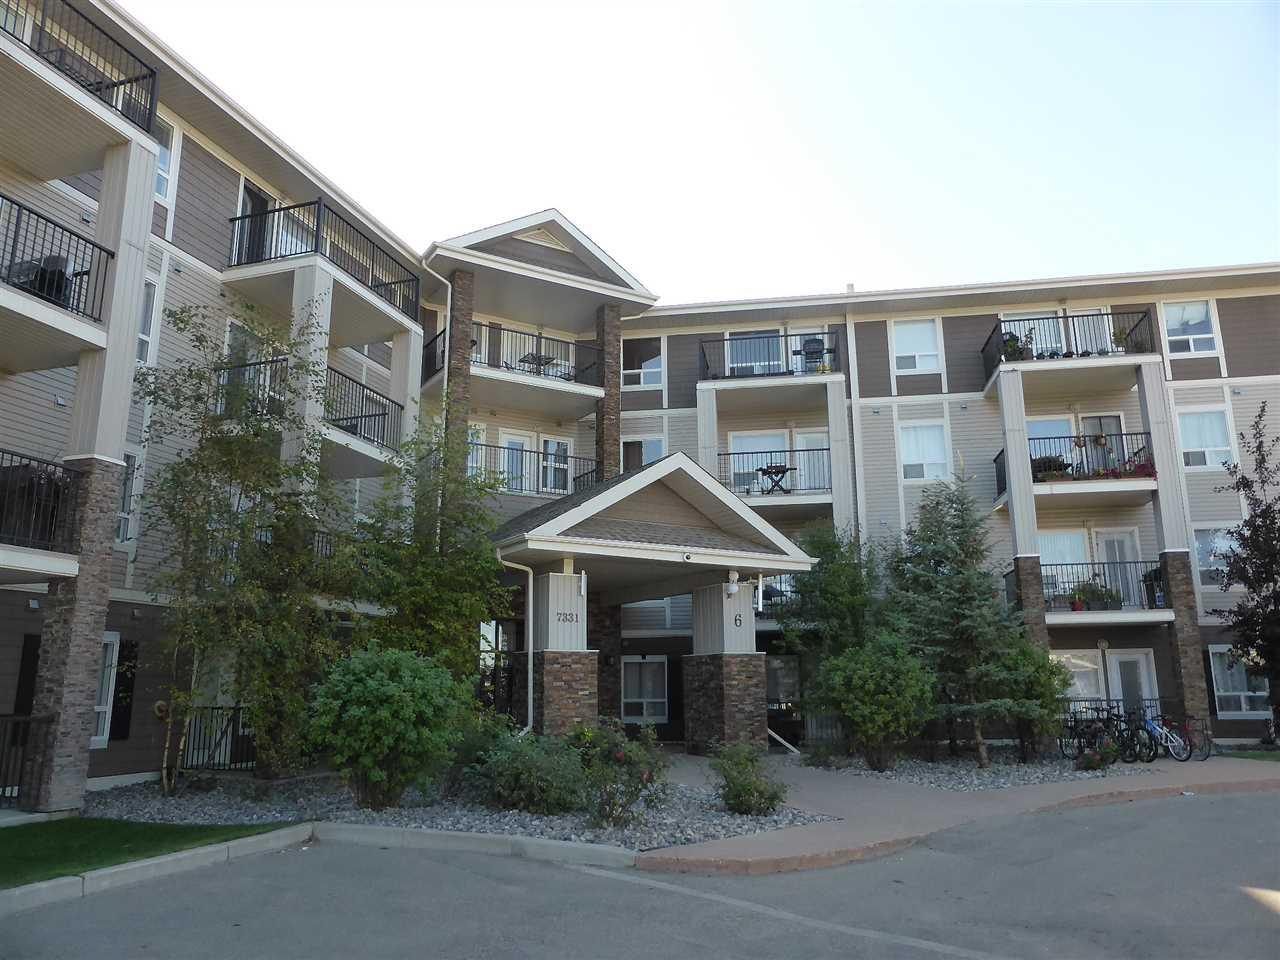 Buliding: 7331 South Terwillegar Drive, Edmonton, AB